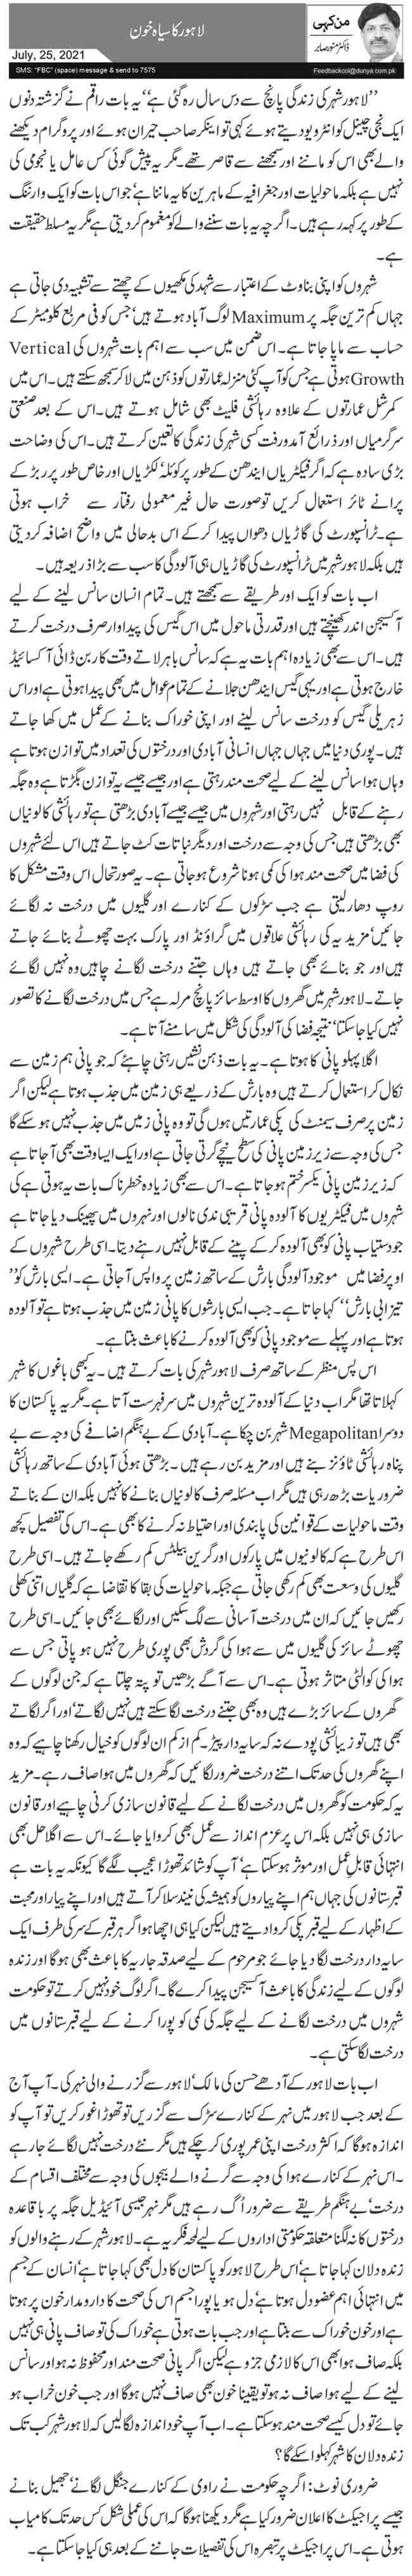 لاہور کا سیاہ خون